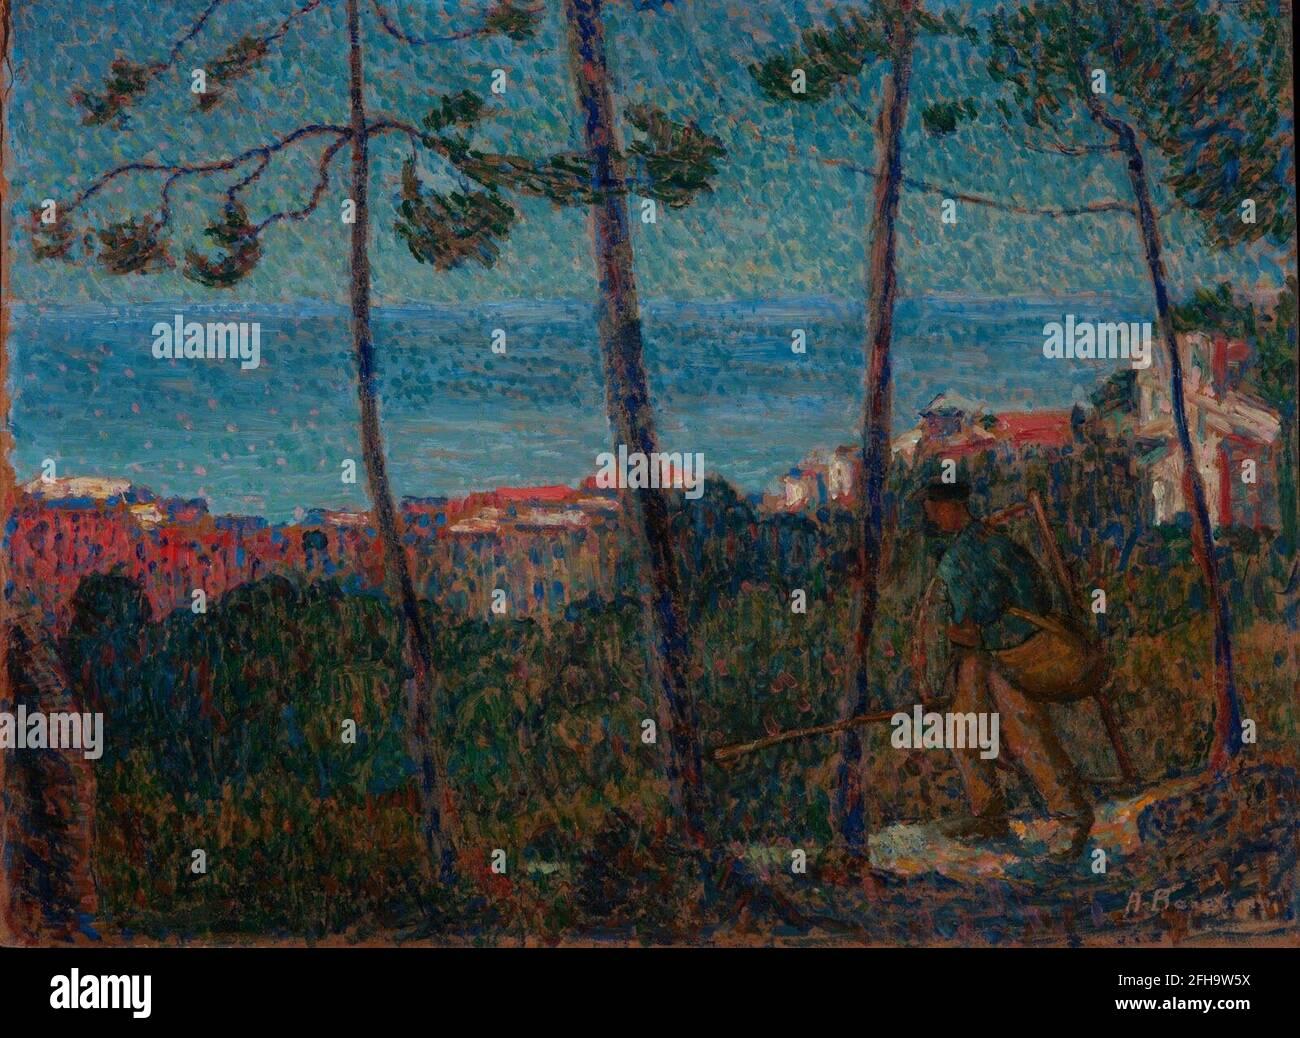 Angelo Barabino Paesaggio ligure, 1918 20 Stockfoto